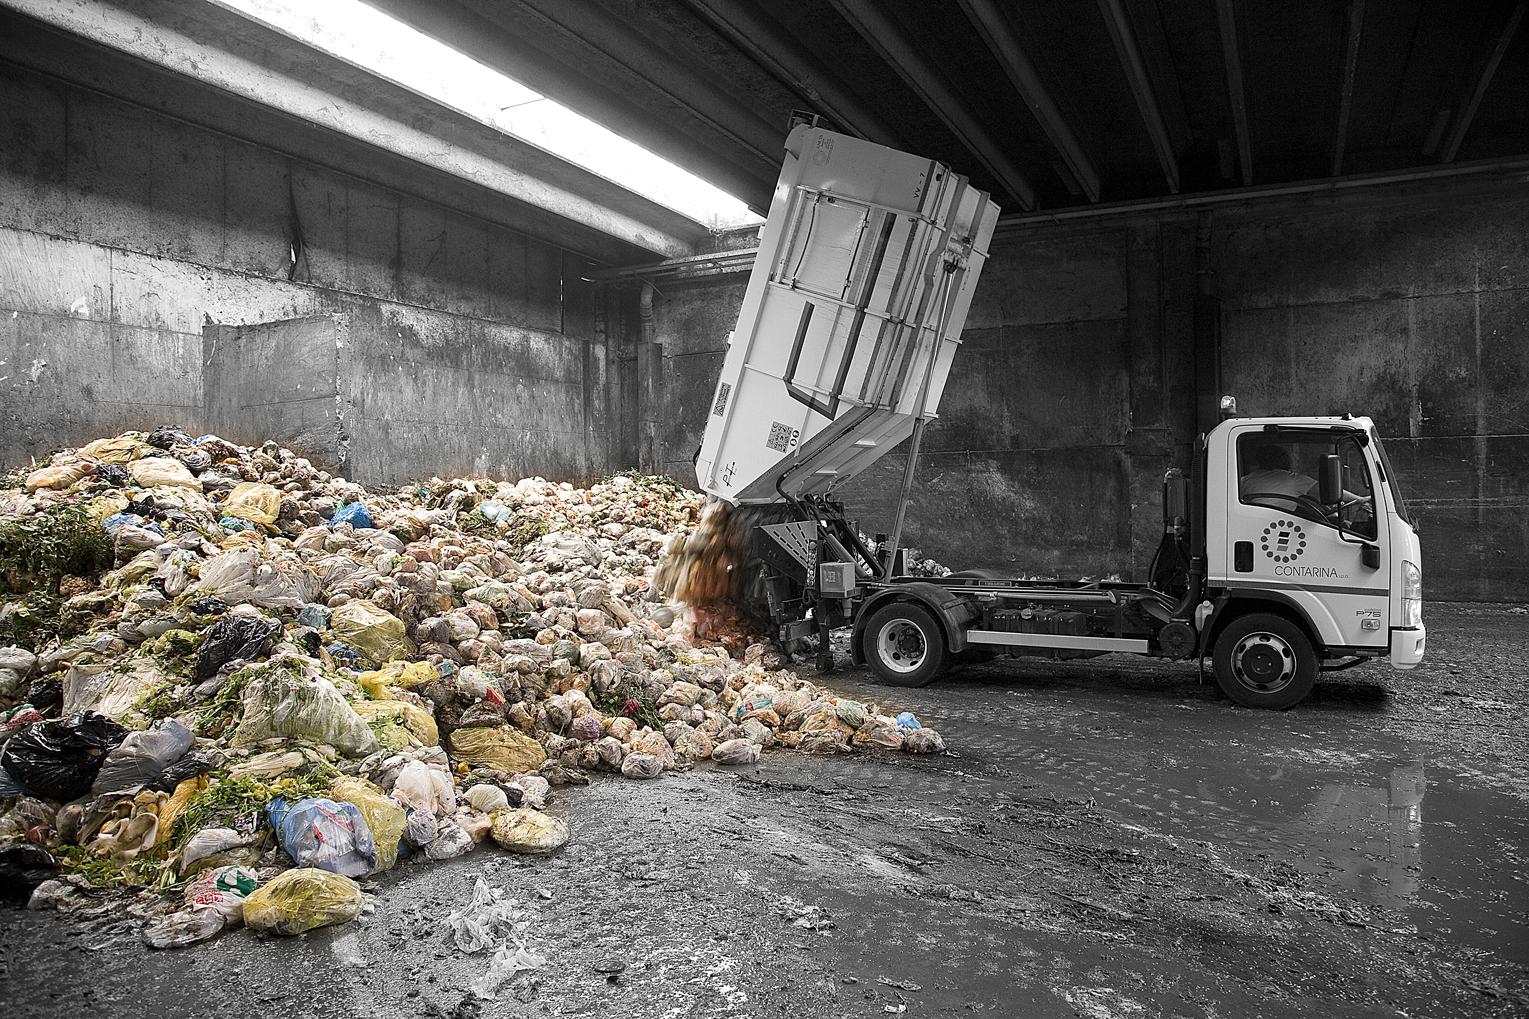 novamont-impianto-compostaggio.jpg